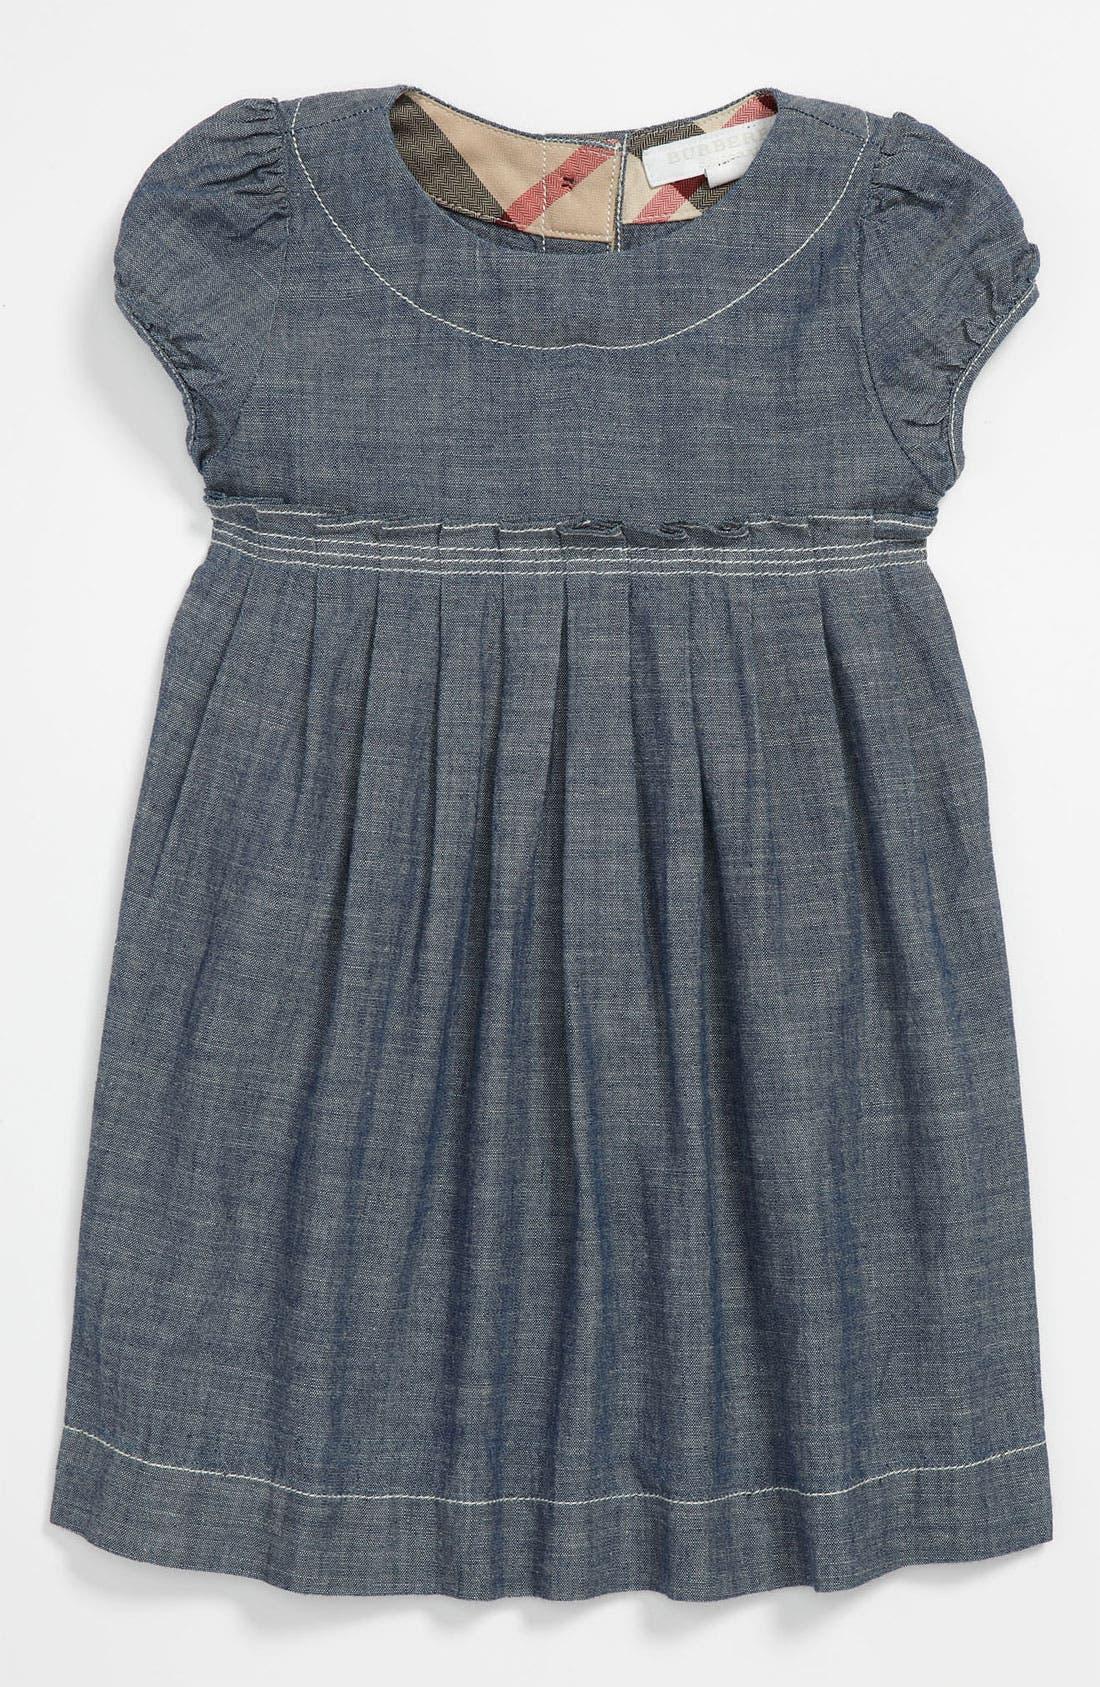 Alternate Image 1 Selected - Burberry 'Coralie' Dress (Infant)